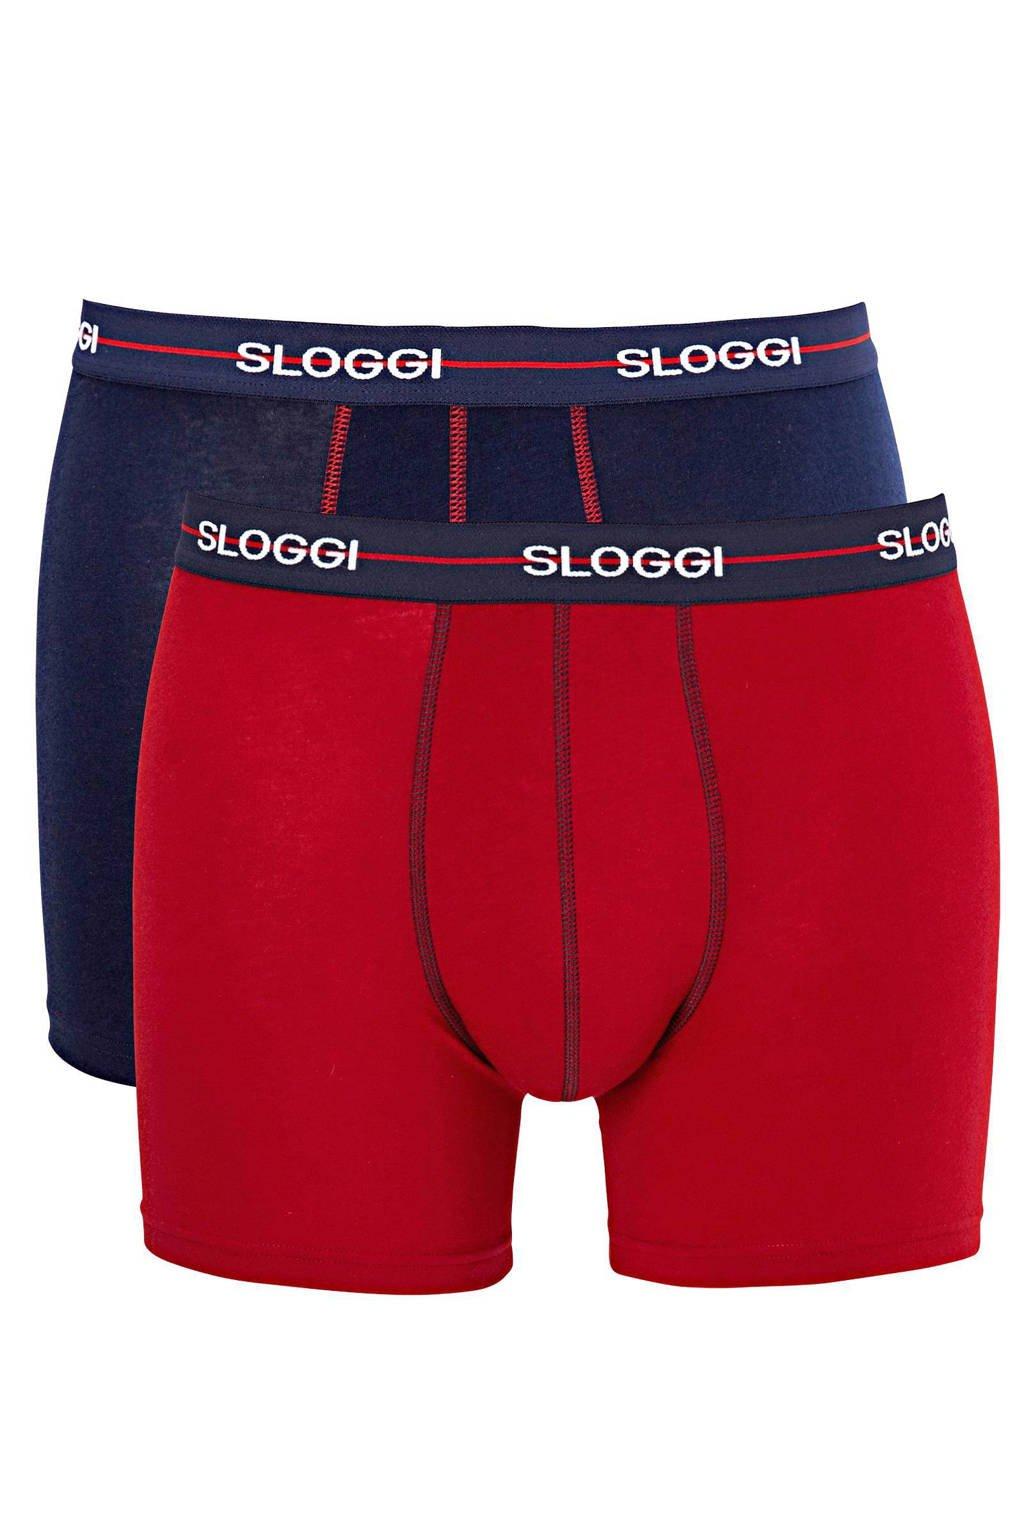 Sloggi Men Start boxershort (set van 2), Marine/rood